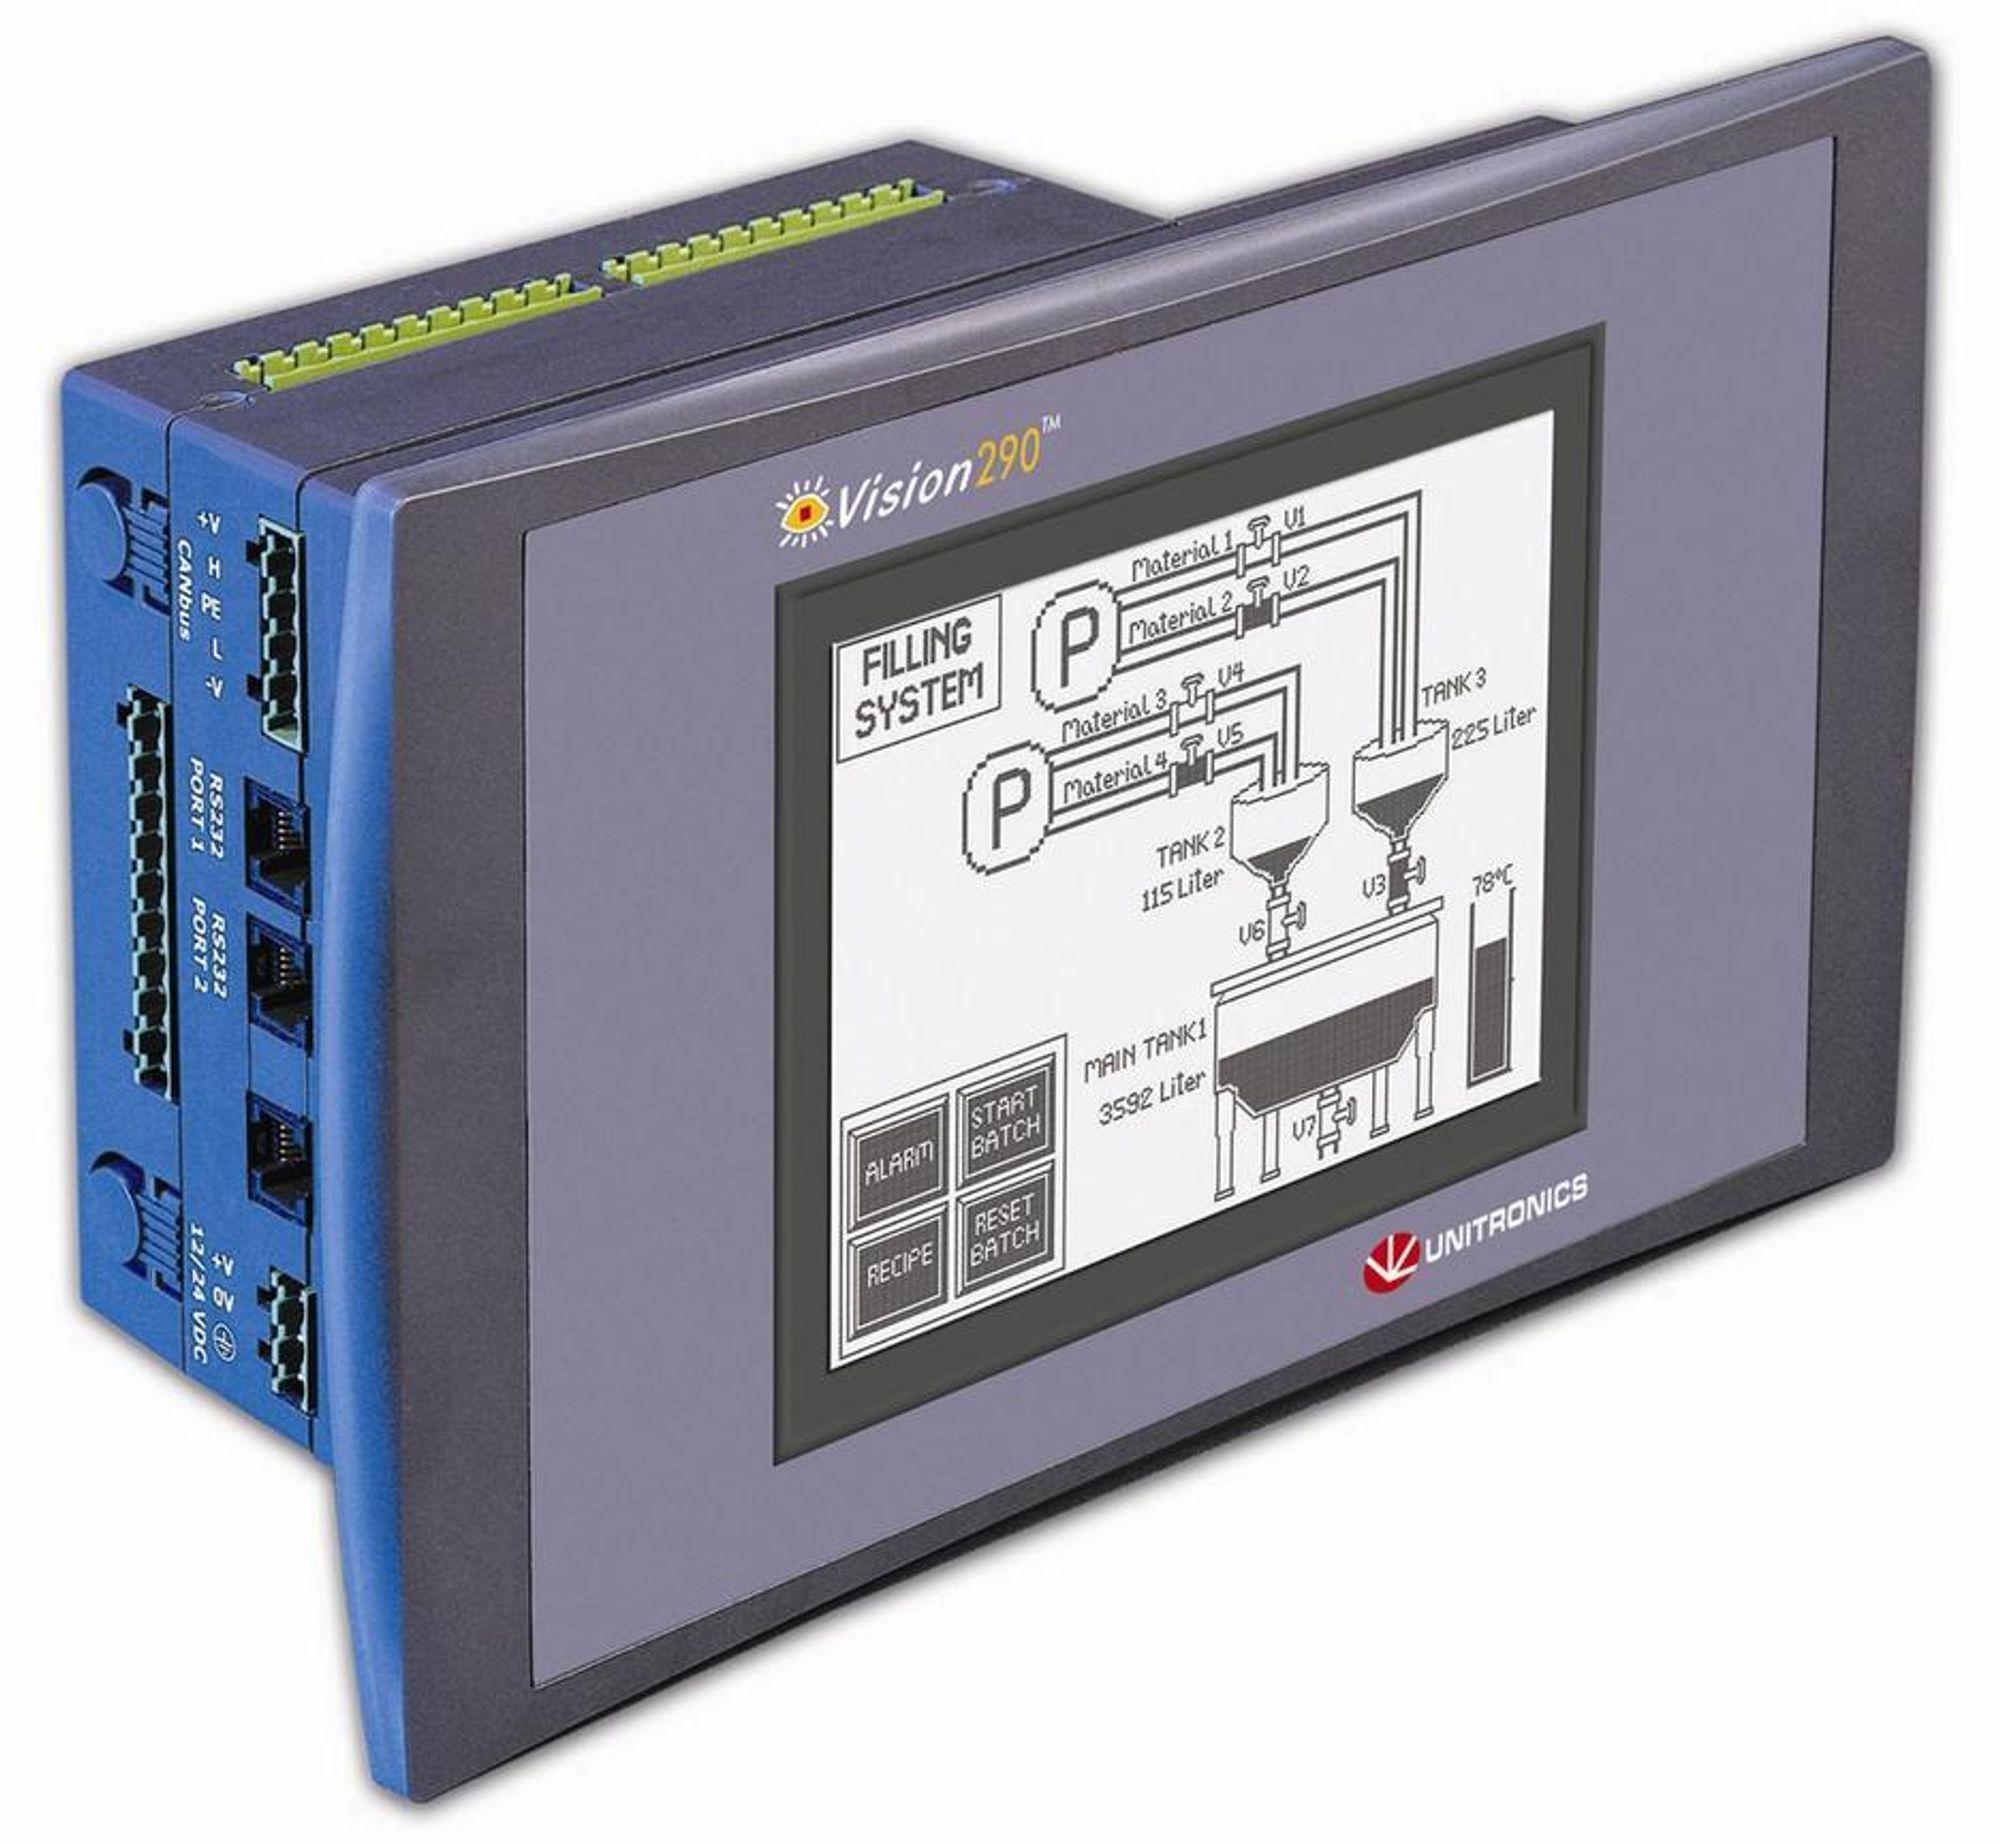 Vision 290 PLS fra Unitronics